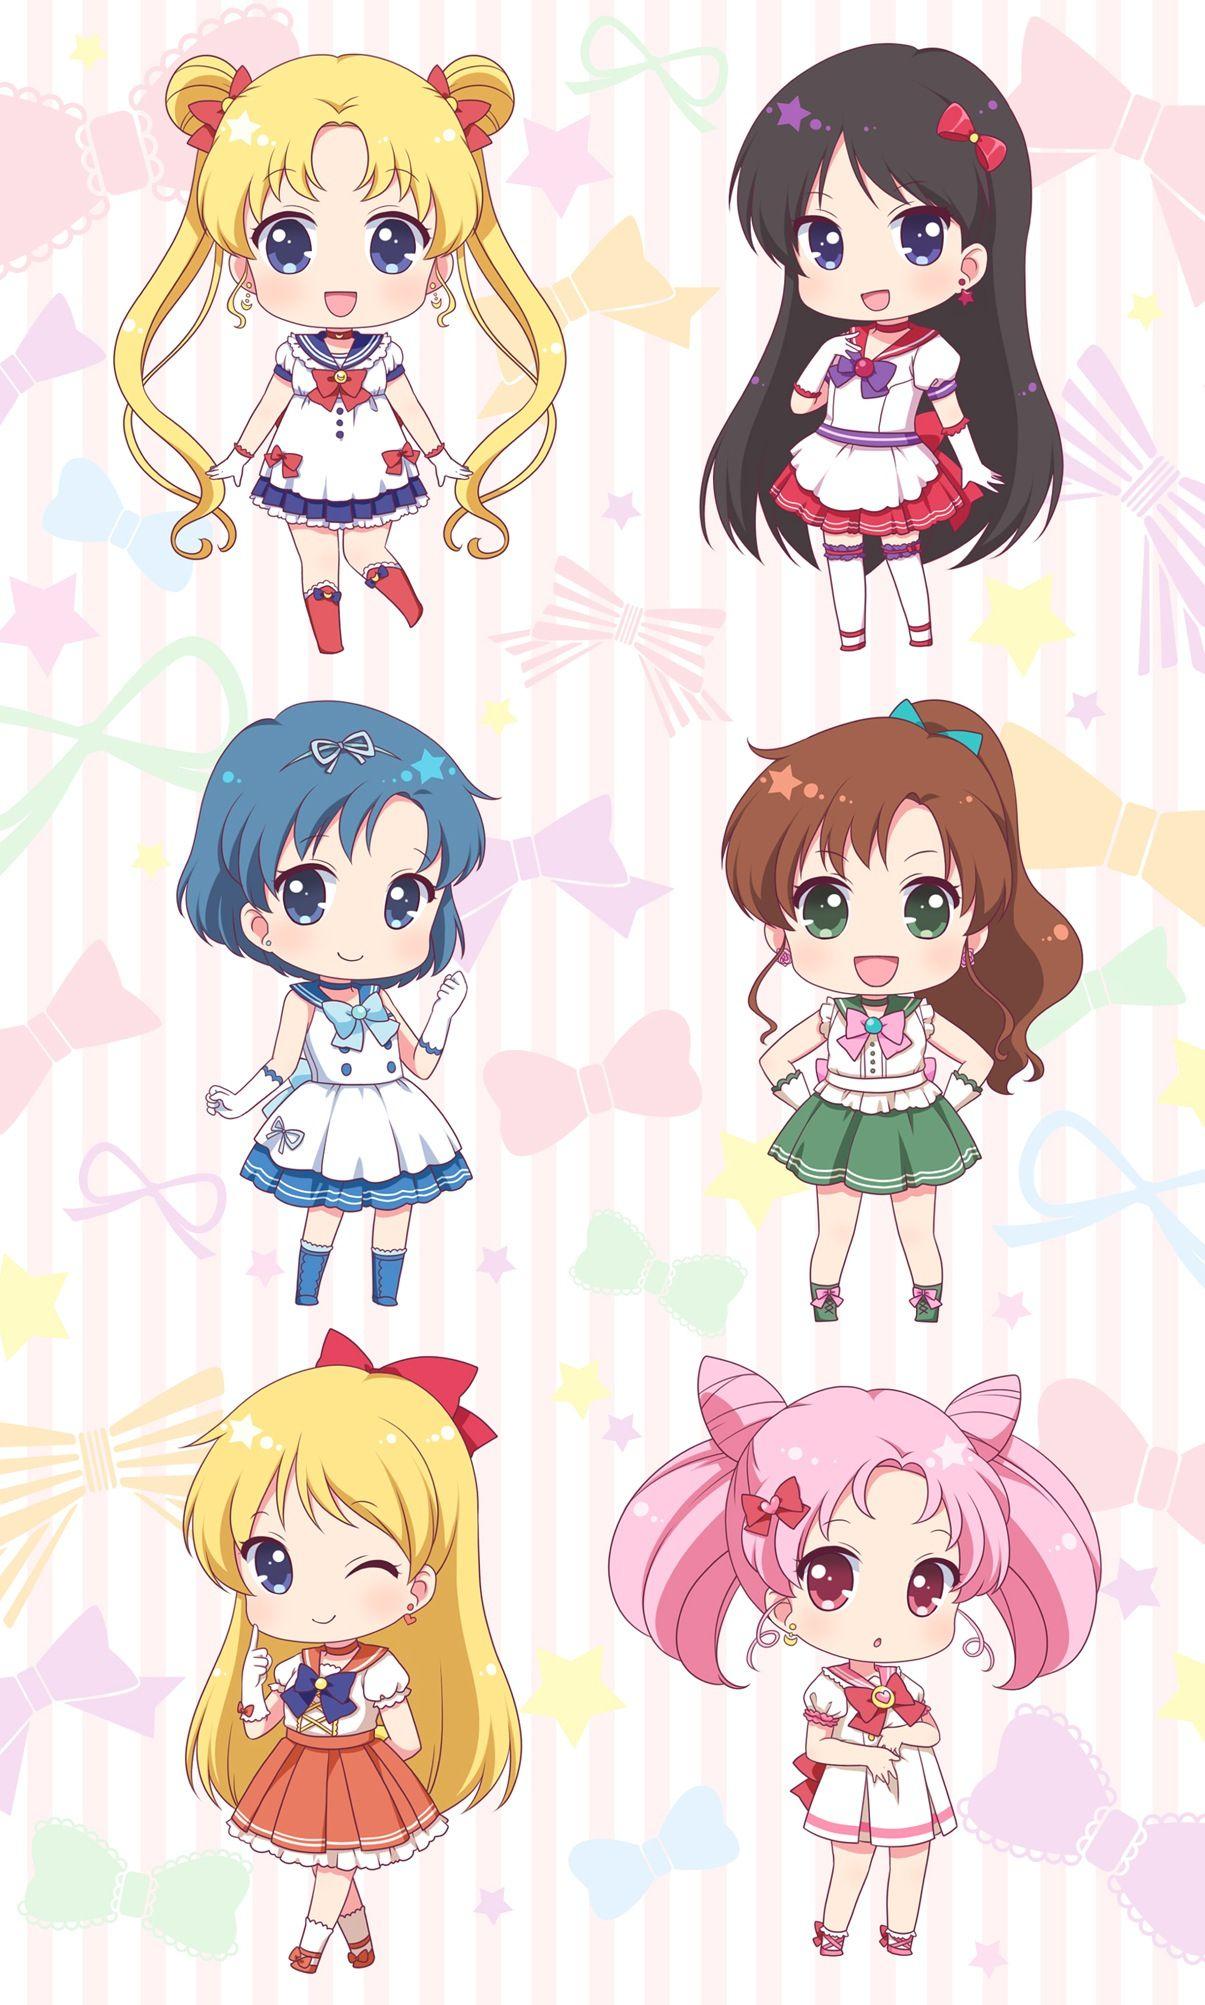 The Sailor Scouts Sailor Moon Sailor Mars Sailor Mercury Sailor Jupiter Sailor Venus Chibi Sailor Moon Fan Art Sailor Moon Crystal Sailor Moon Wallpaper